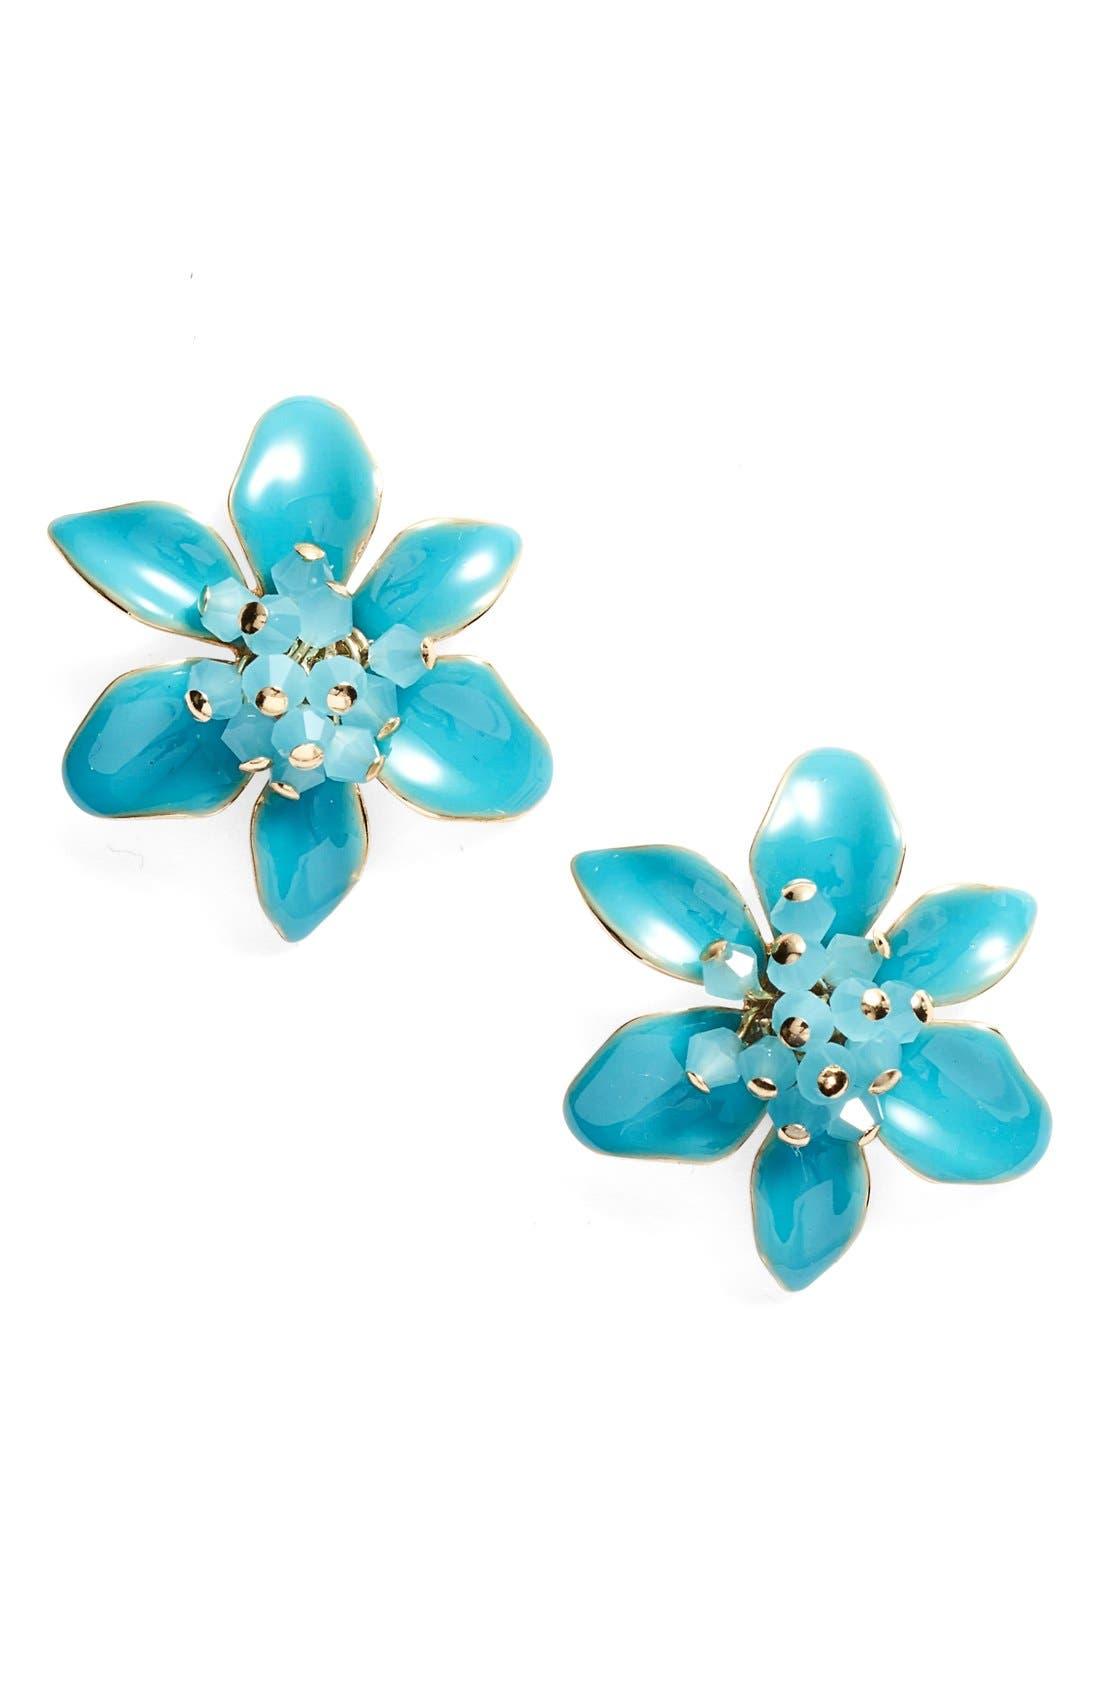 KATE SPADE NEW YORK, 'lovely lilies' stud earrings, Main thumbnail 1, color, 440